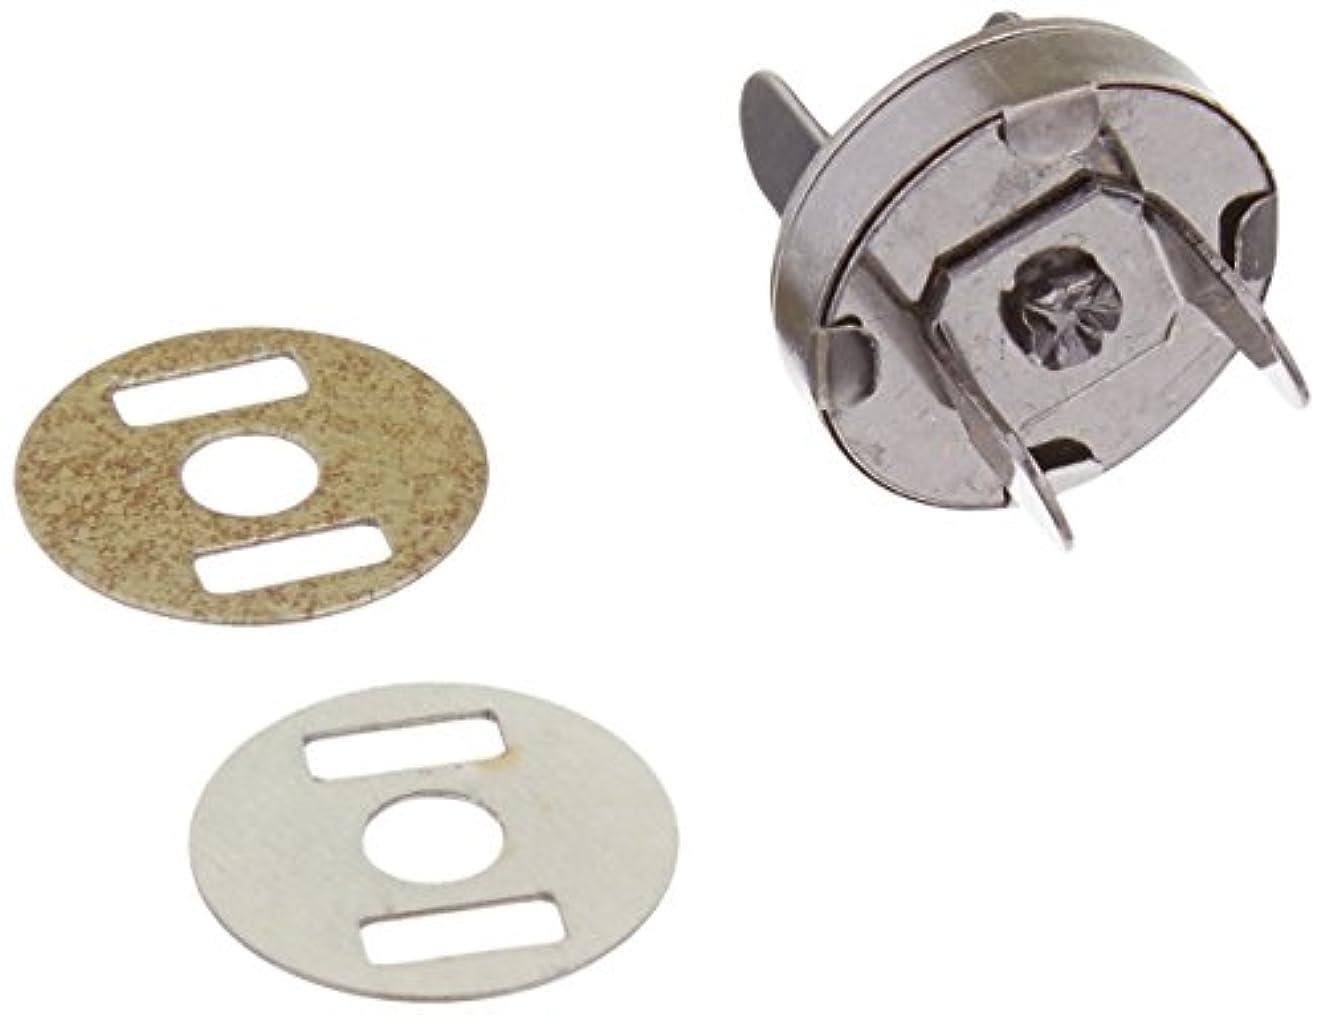 Sunbelt Fasteners MS14MM-BN Magnetic Purse Snap, 14 mm, Black Nickel